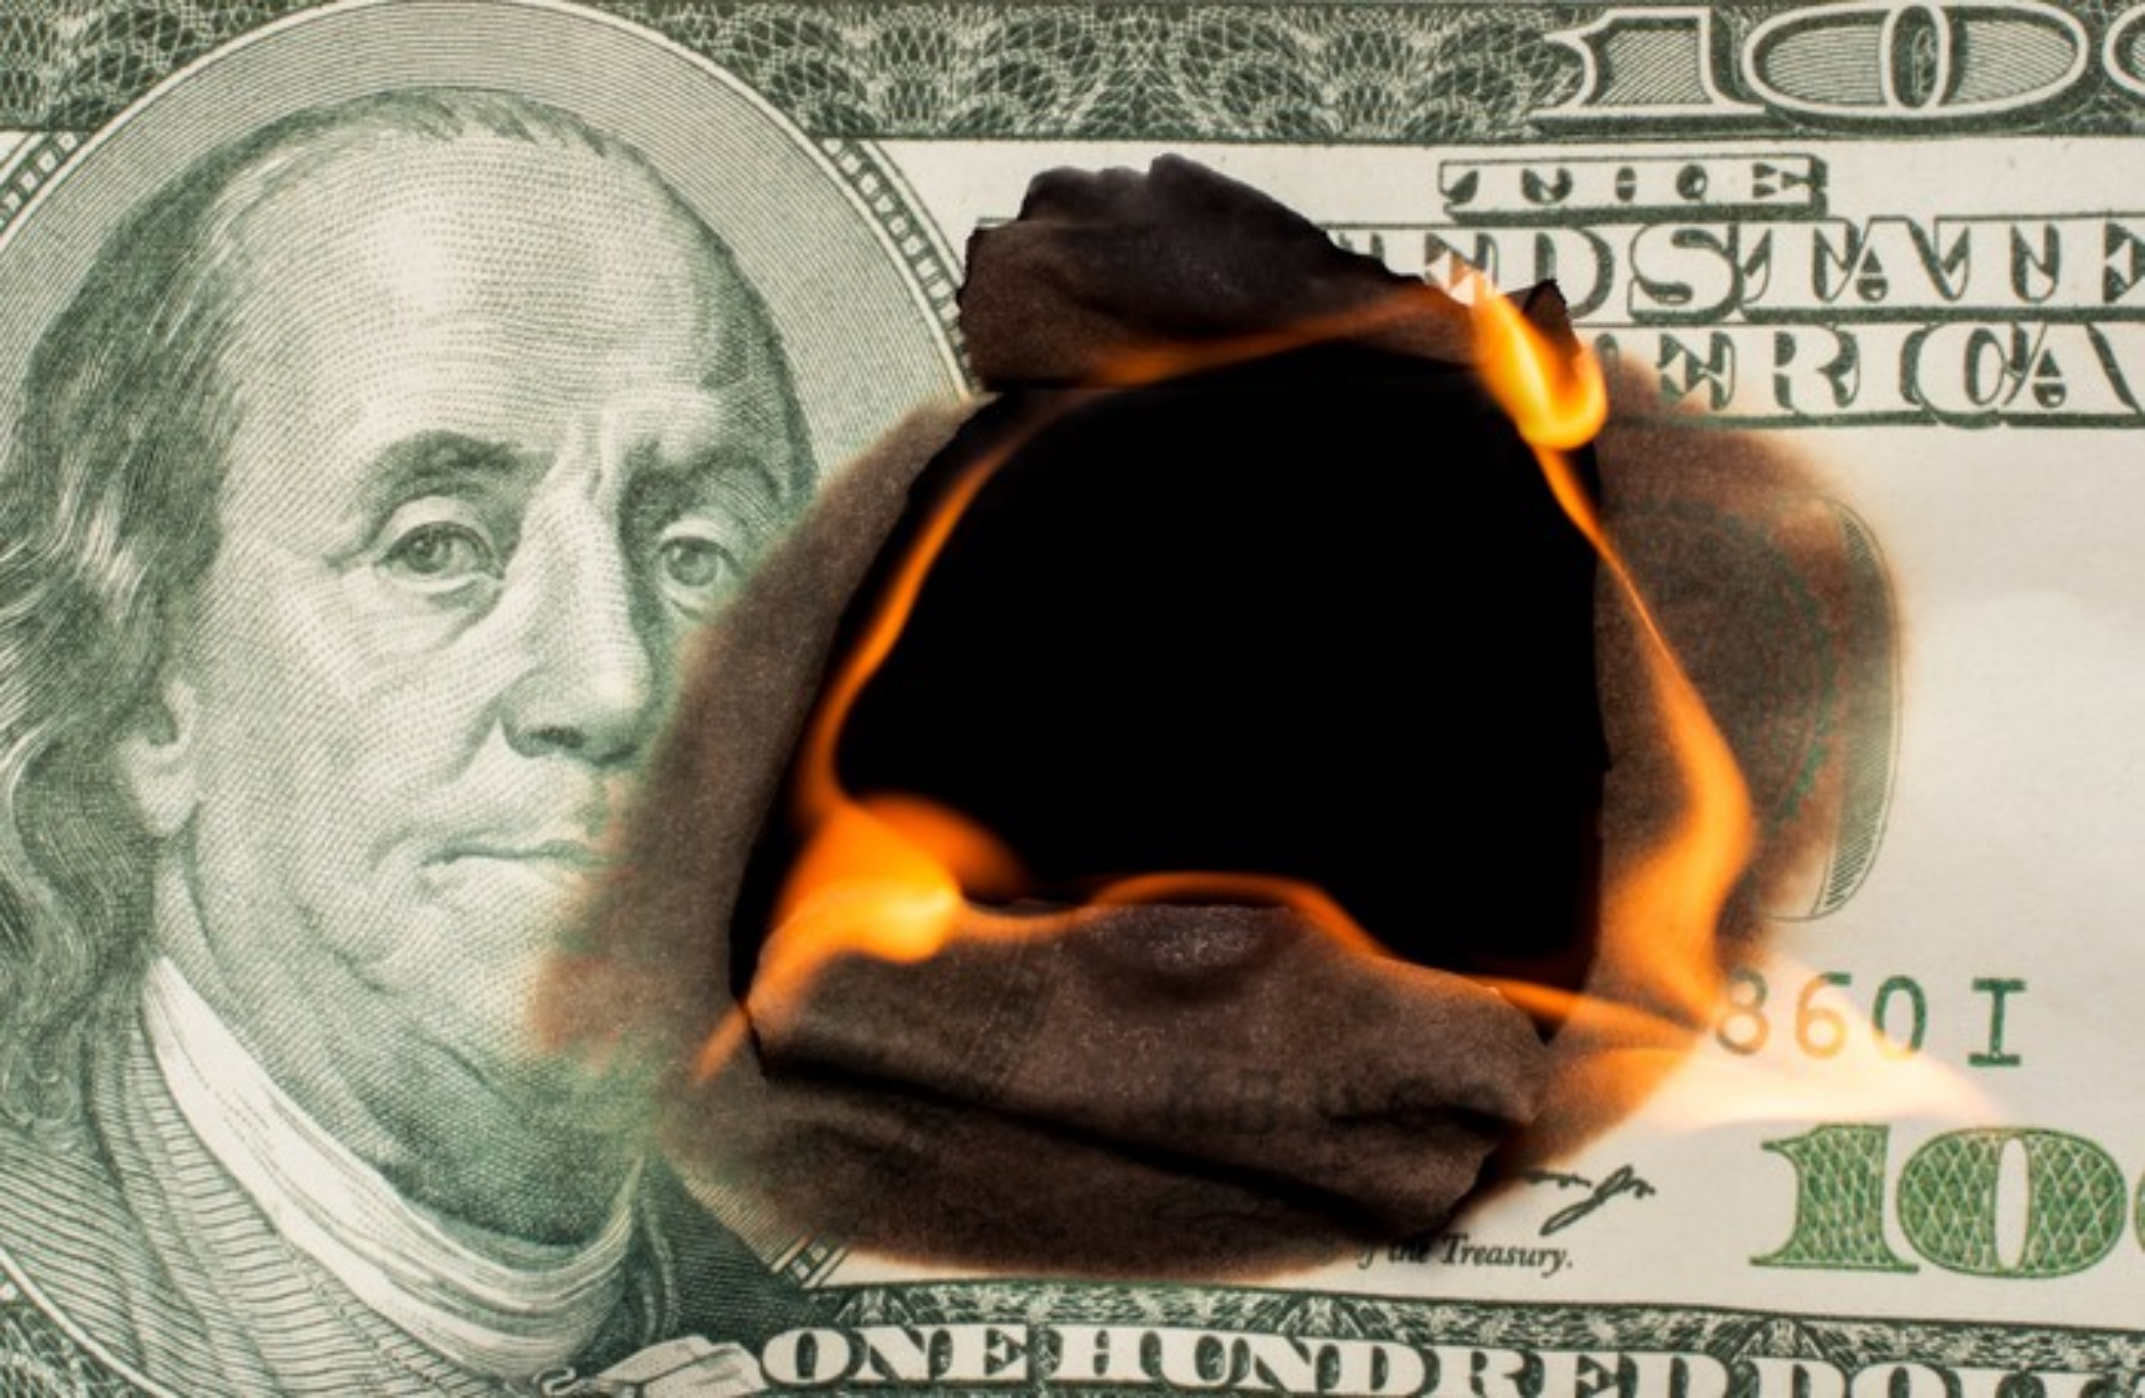 A flame burning through a $100 bill